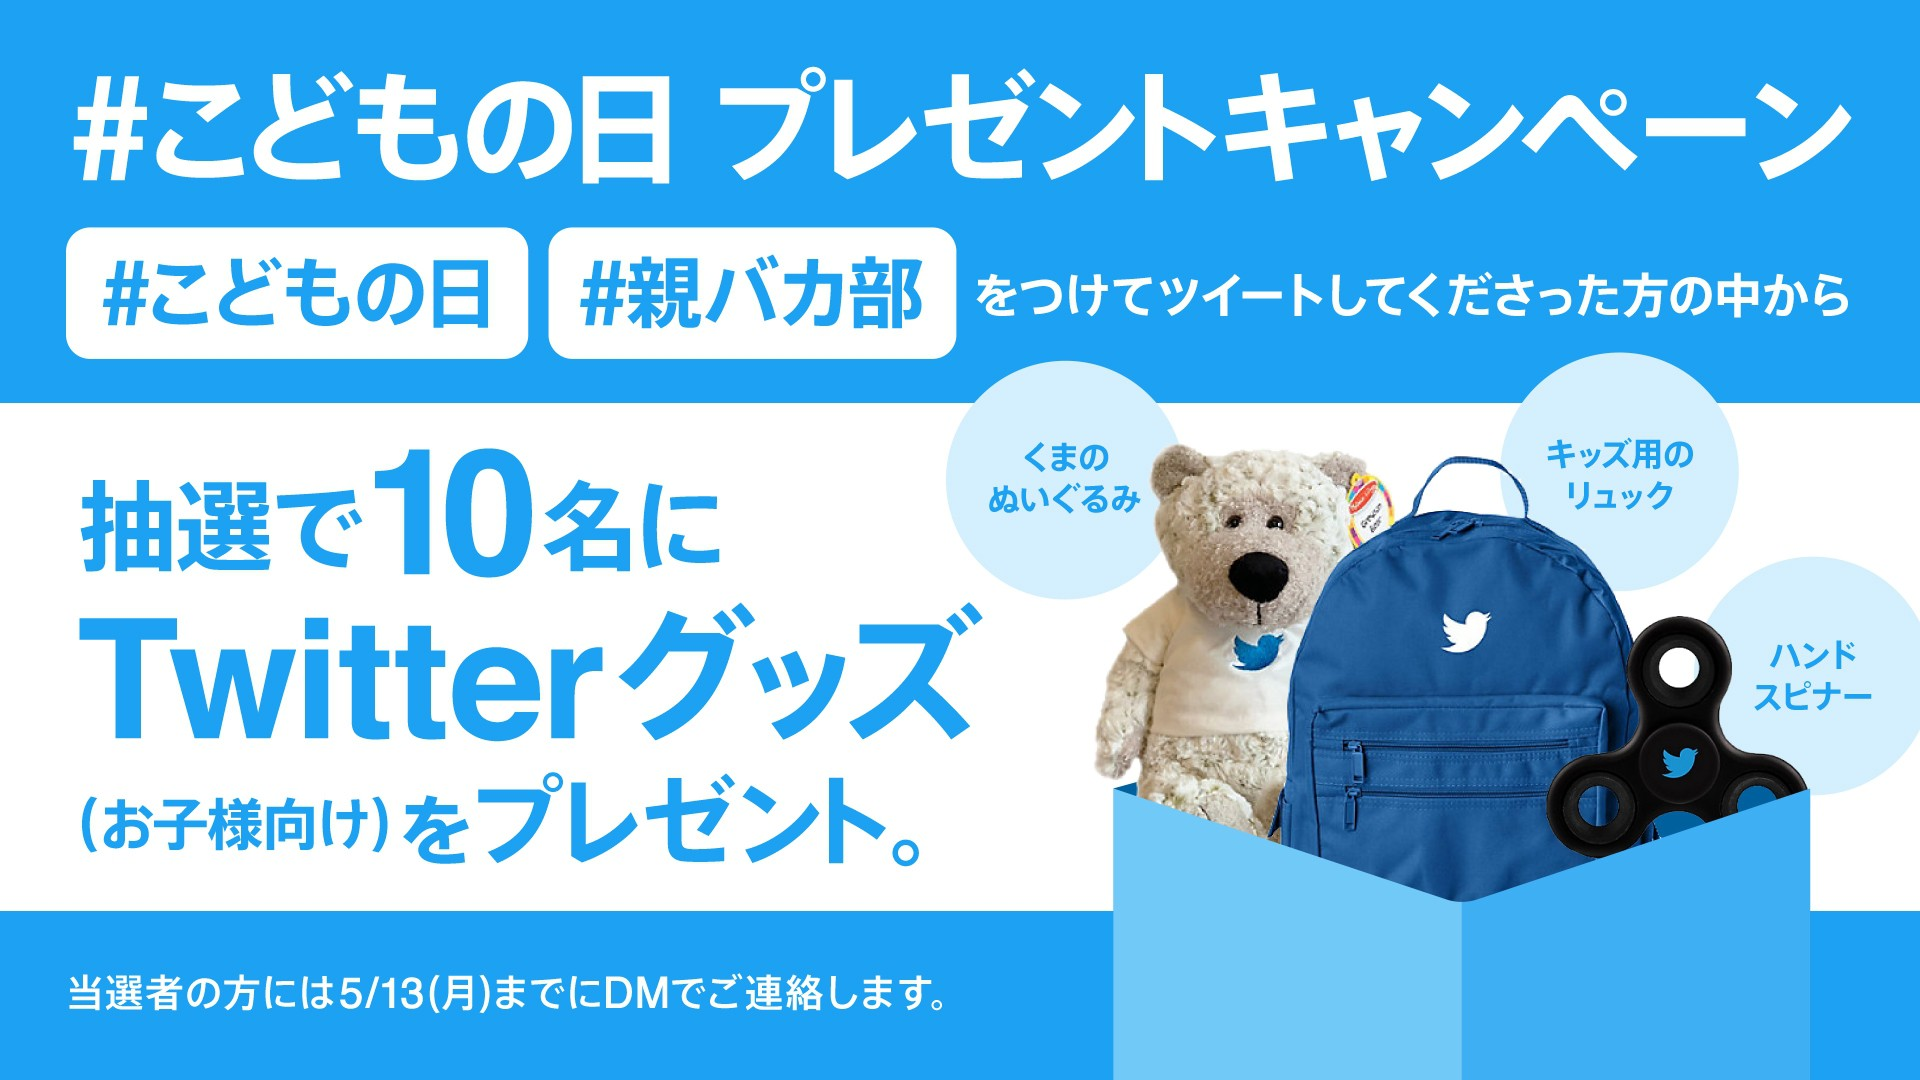 twitter-campaign-goldenweek-twitter-japan-1